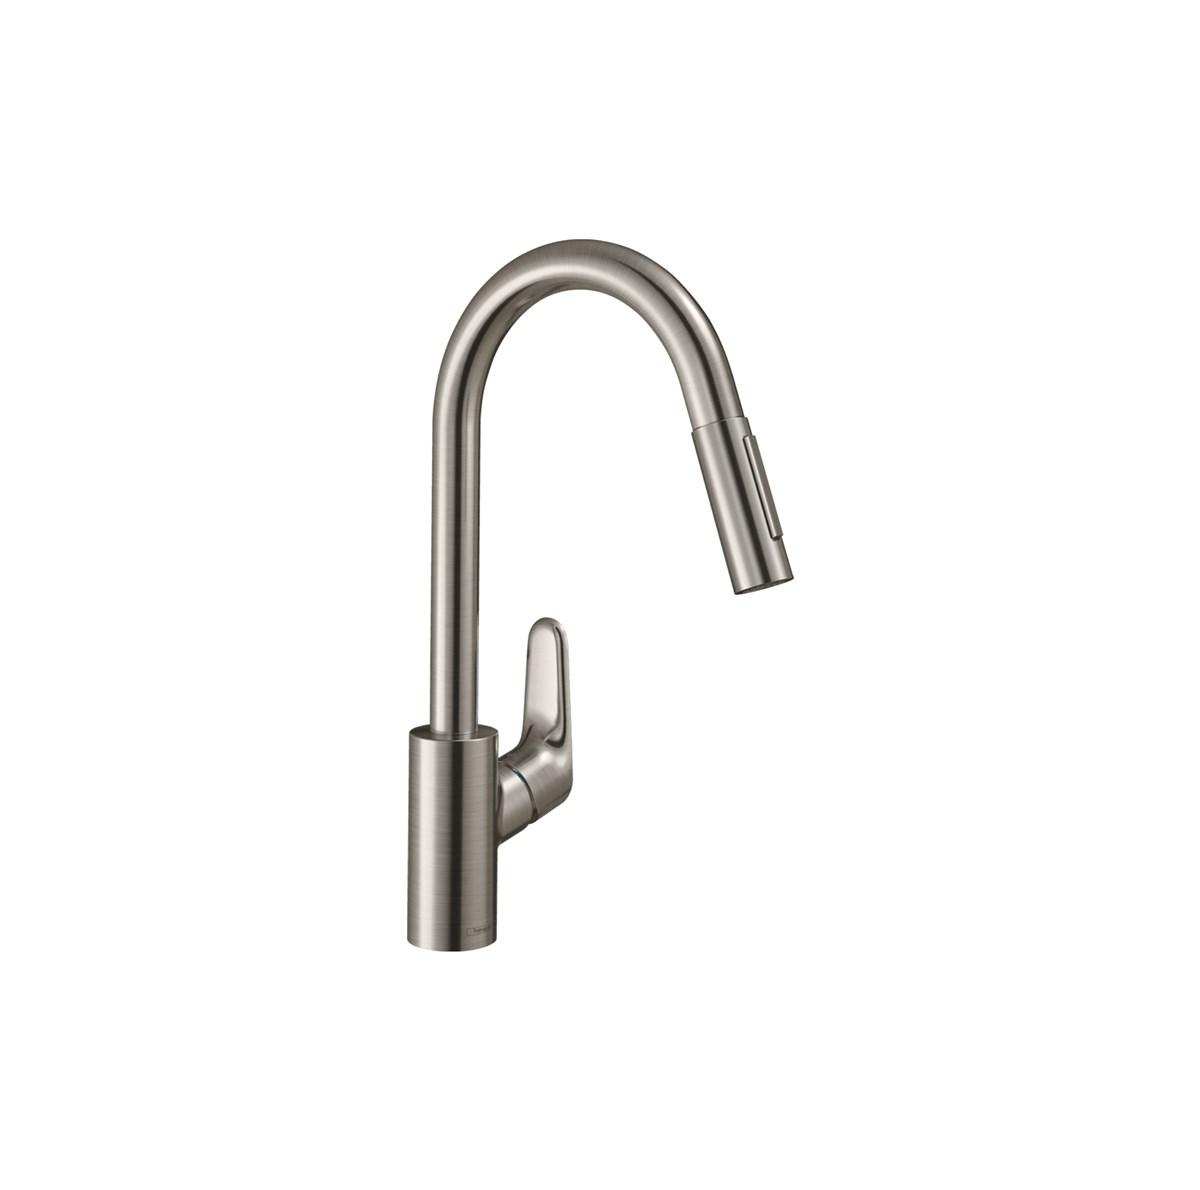 Hansgrohe-Focus-M41-Kitchen-Mixer-240-31815800-Matisse-1